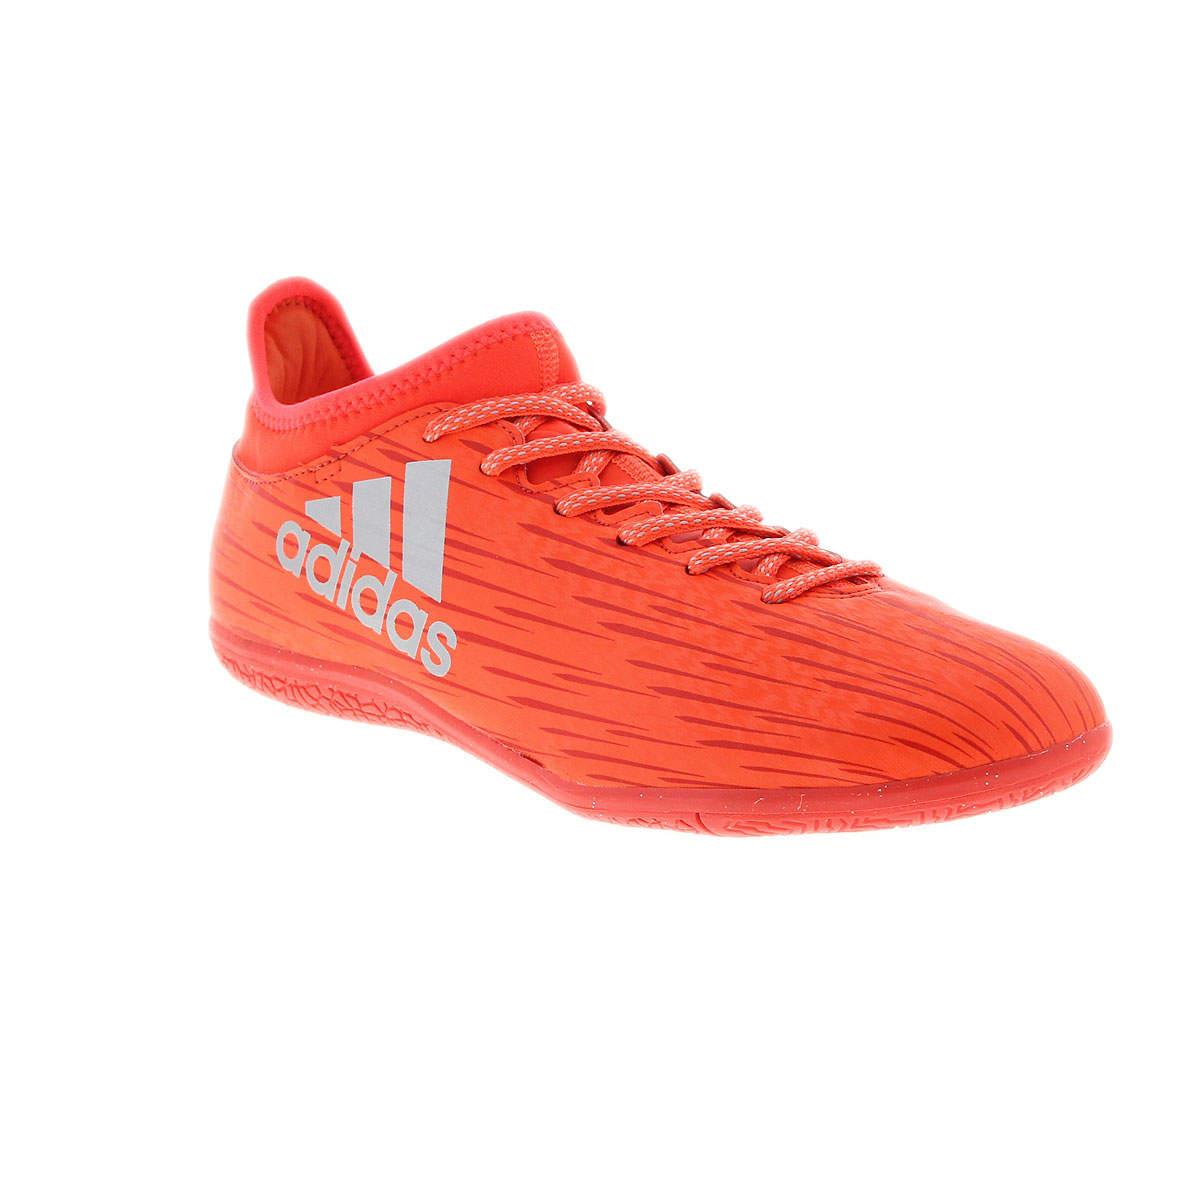 a164045777 Tênis Adidas X 16.3 Futsal - Mundo do Futebol